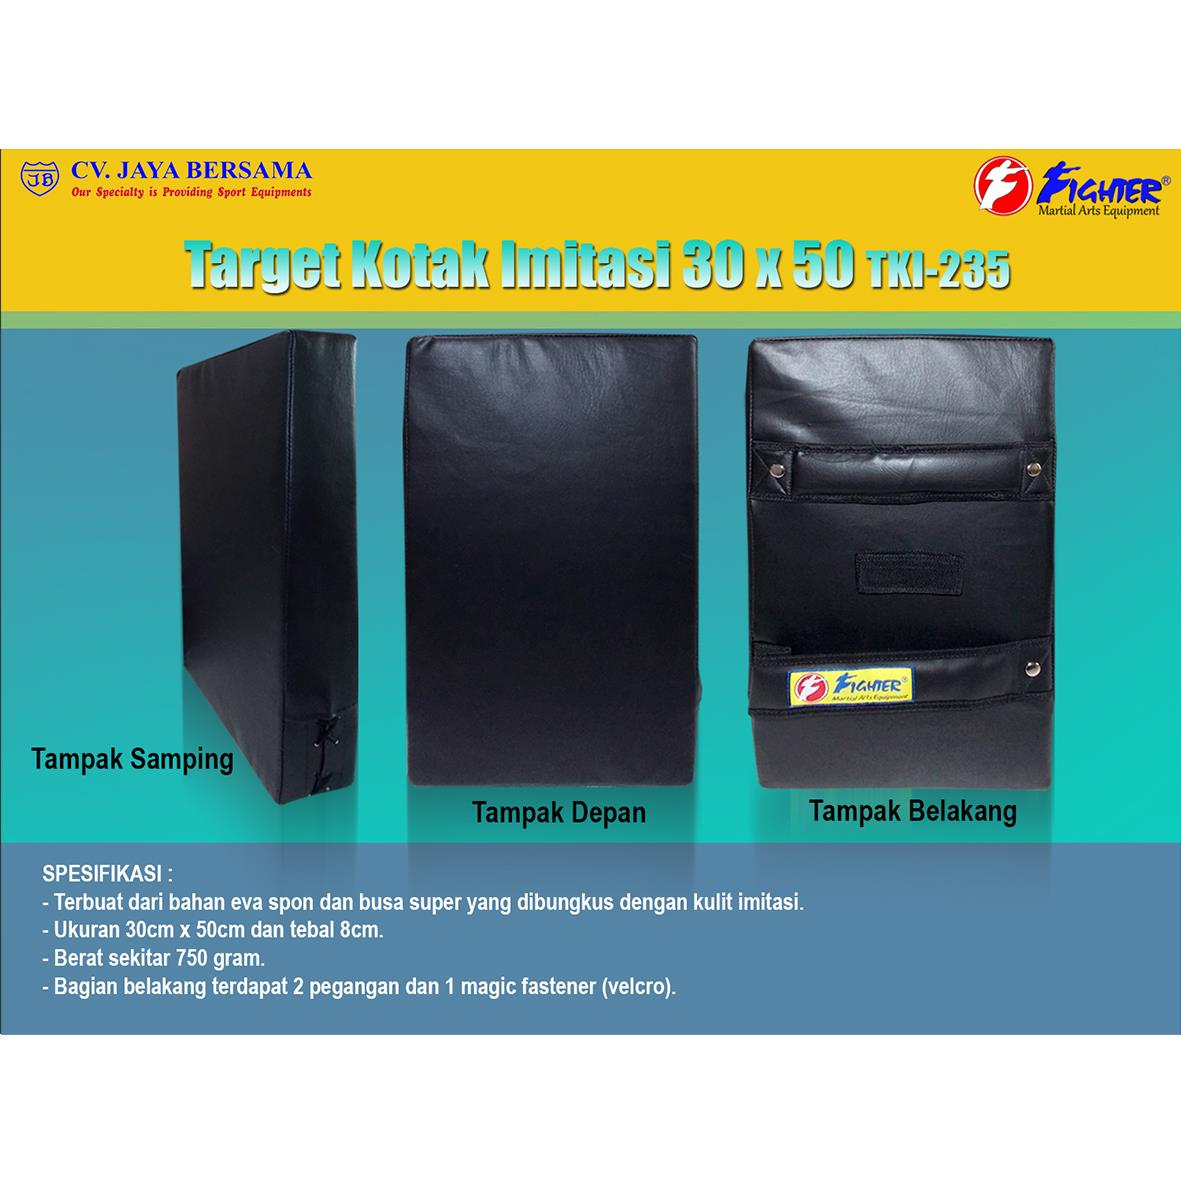 Sell Target Imitation Box 30x50 From Indonesia By Cv Jaya Bersama Busa Eva 50cm Bersamacheap Price